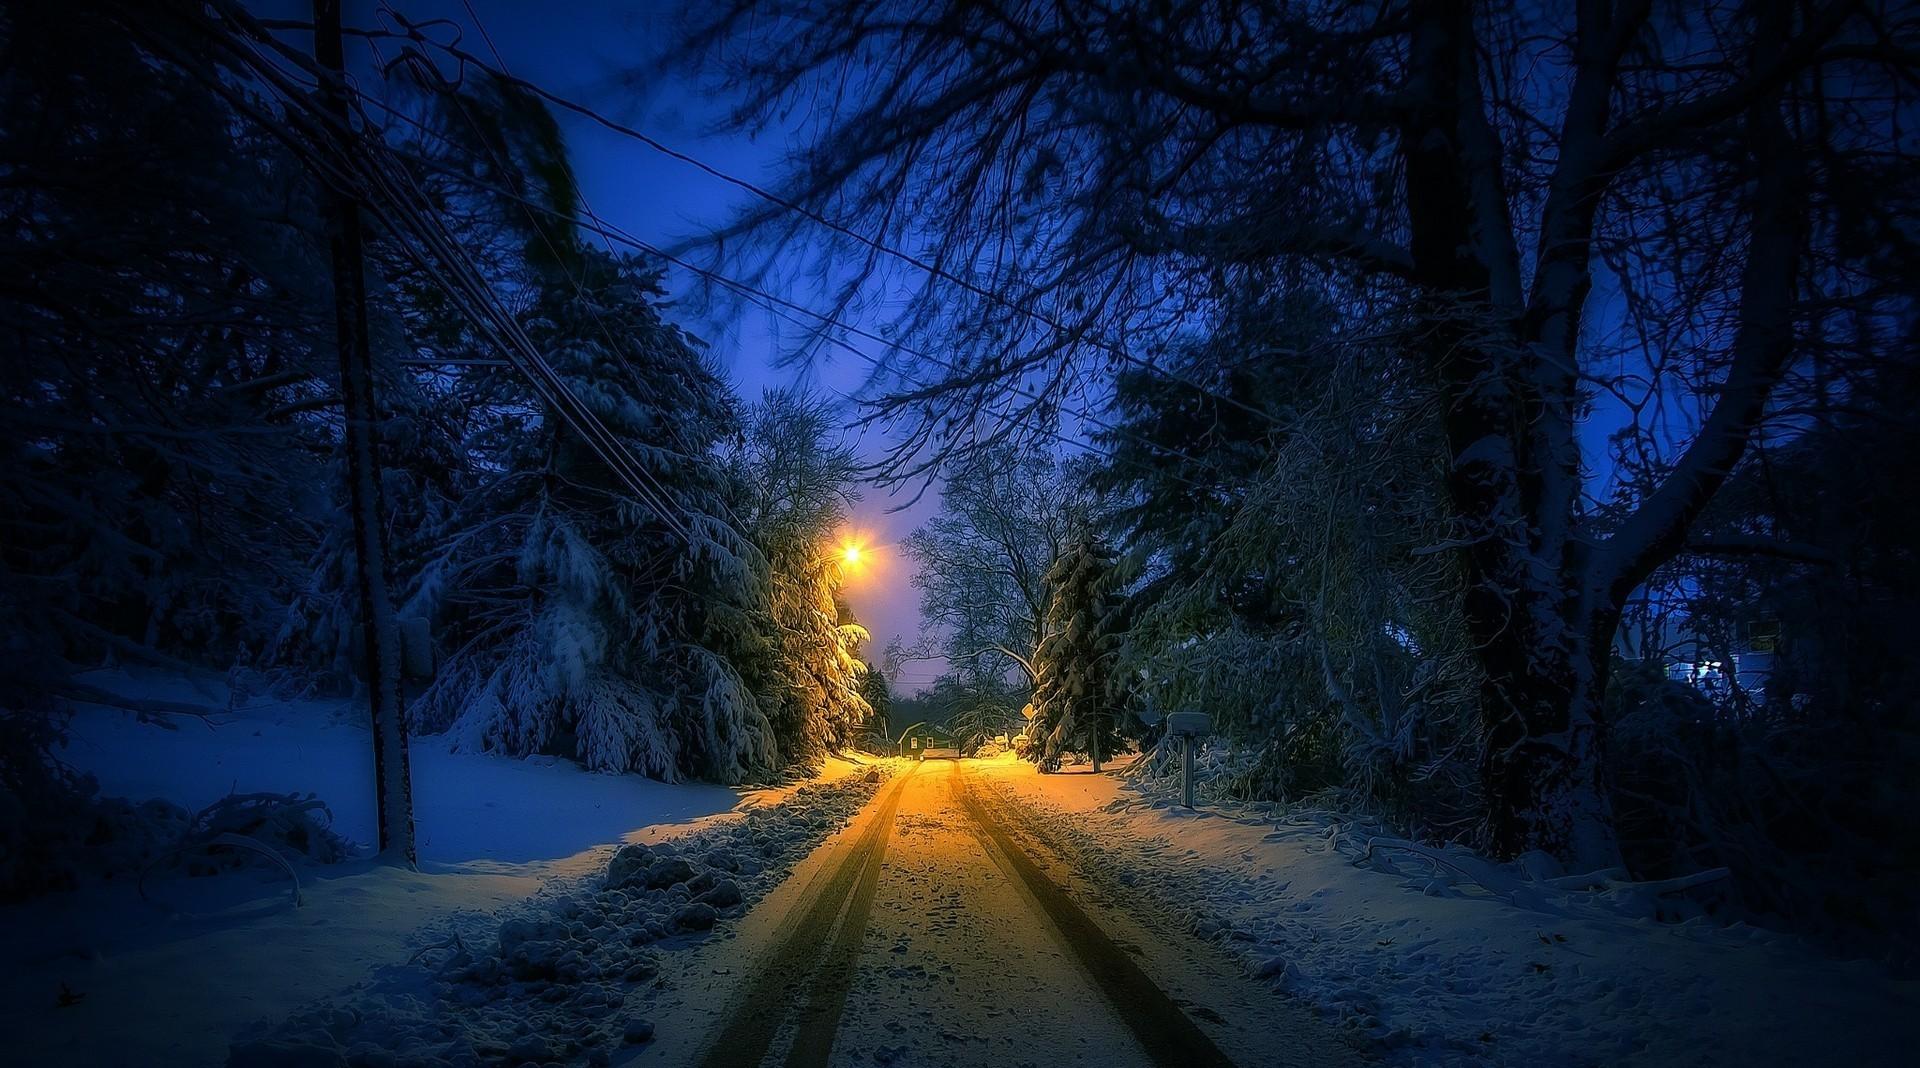 ... Snow, Winter, Branch, Lantern, Cold, Evening, Morning, Tracks,  Connecticut, Light, Tree, Weather, Season, Darkness, Screenshot,  Atmospheric Phenomenon, ...